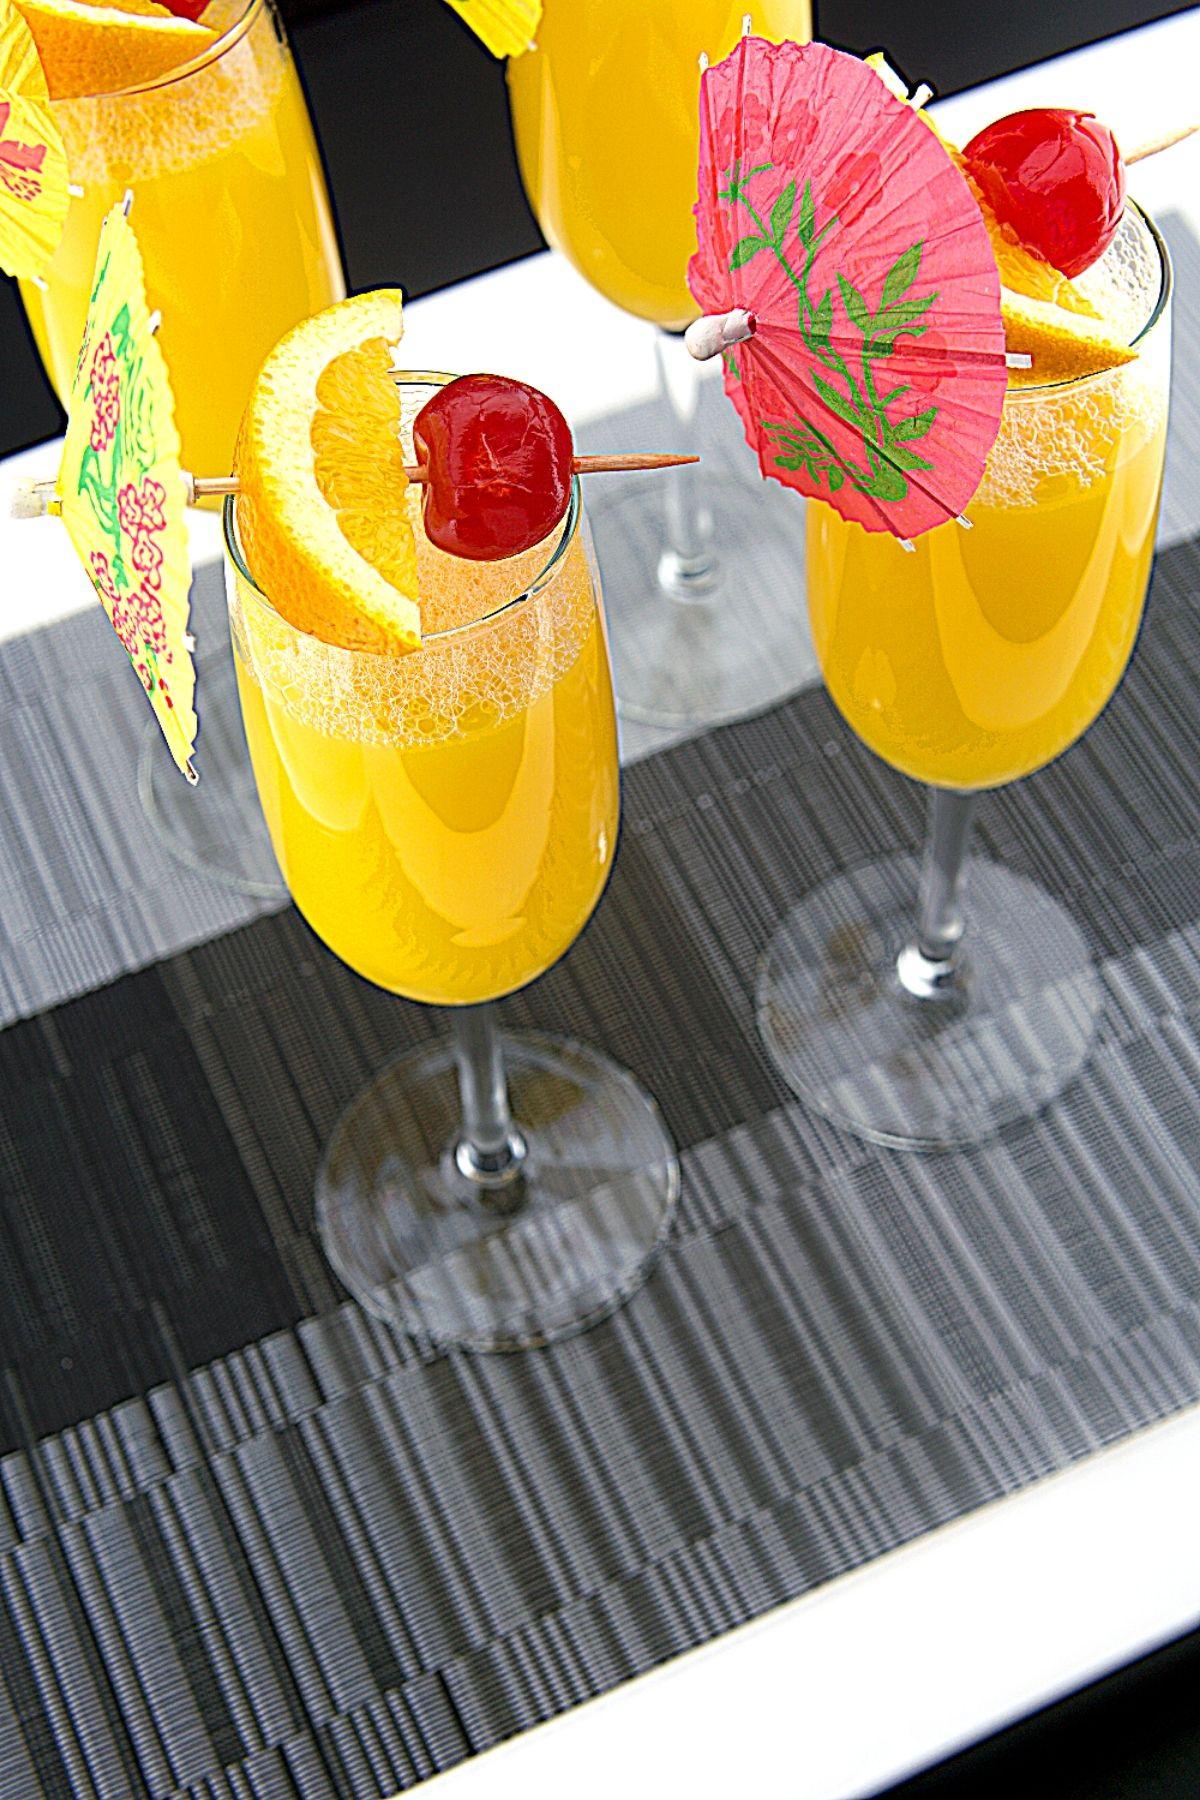 Orange Juice Dirty Orange Mimosa Brunch Cocktails Recipe 7 of 7